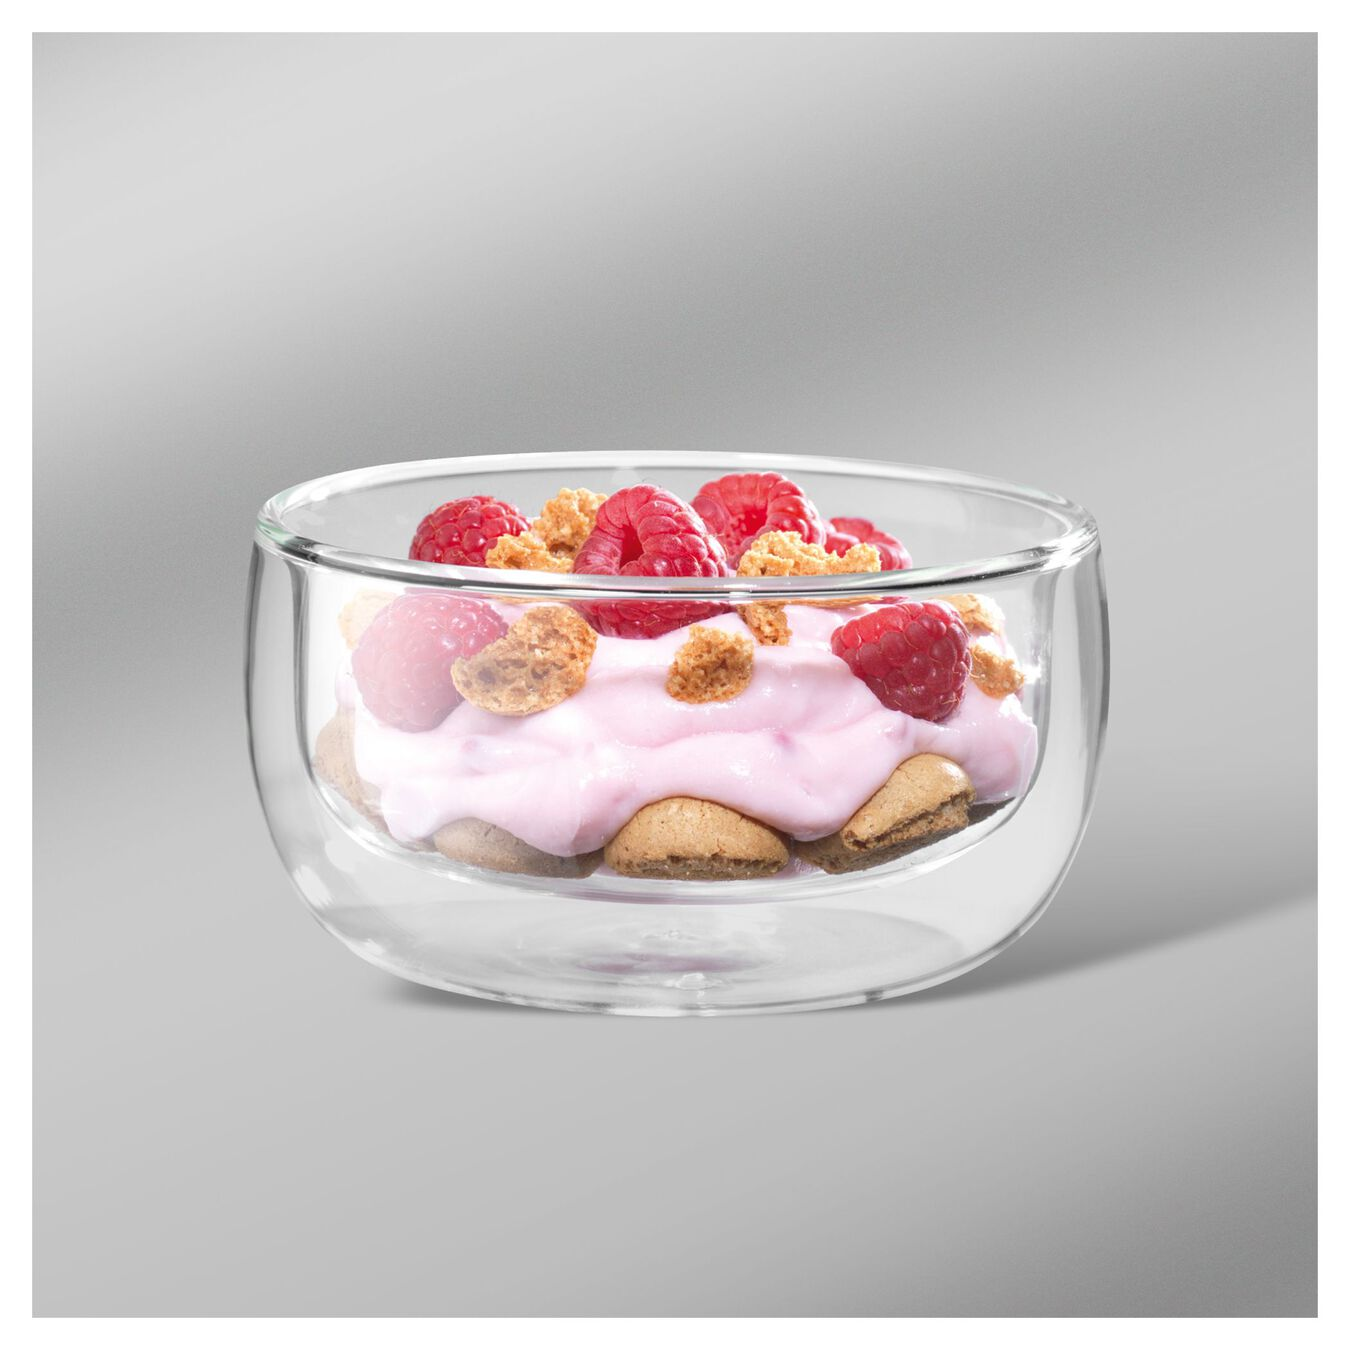 Dubbelwandig Dessertglazenset, 2-delig,,large 2